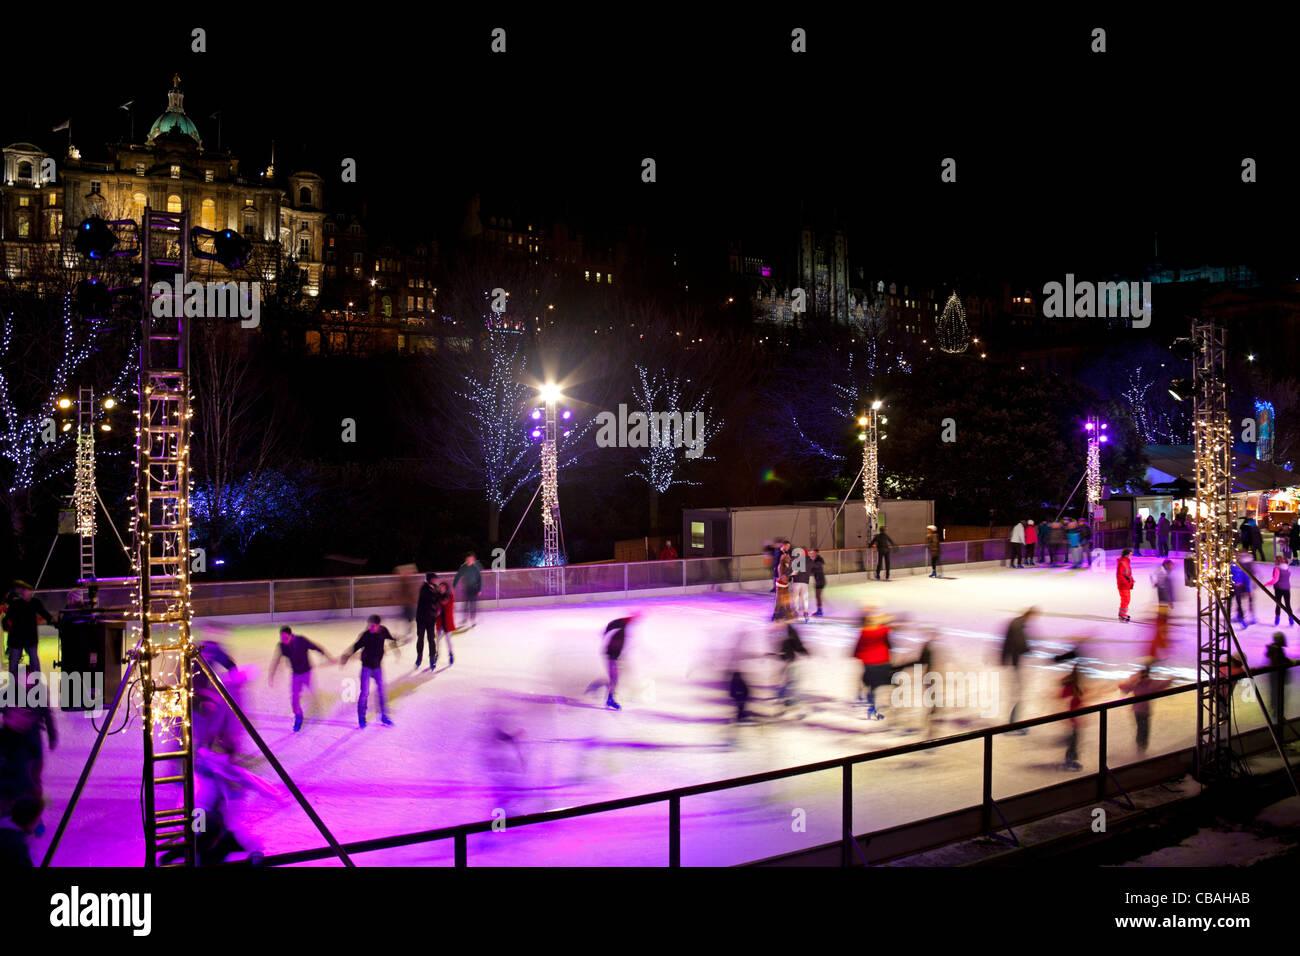 Edinburgh Christmas Ice Rink, Scotland UK Europe Stock Photo